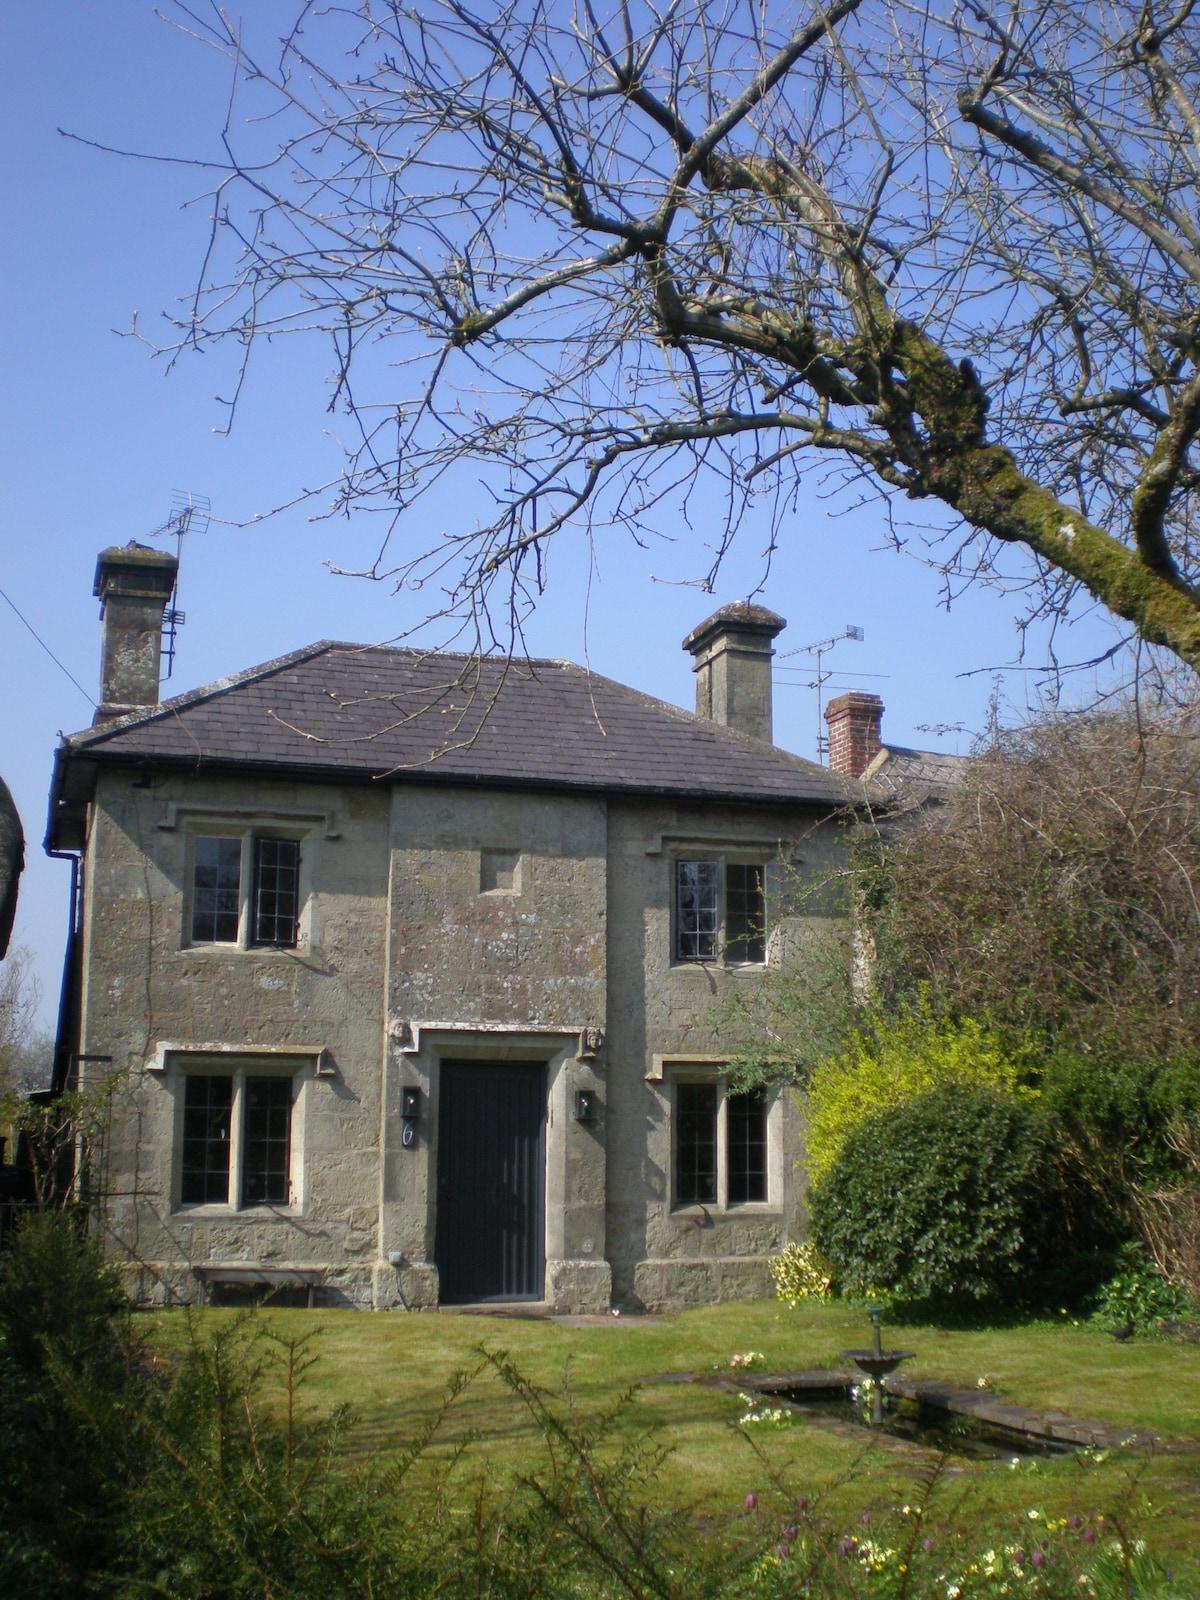 Stillness within a stone cottage.